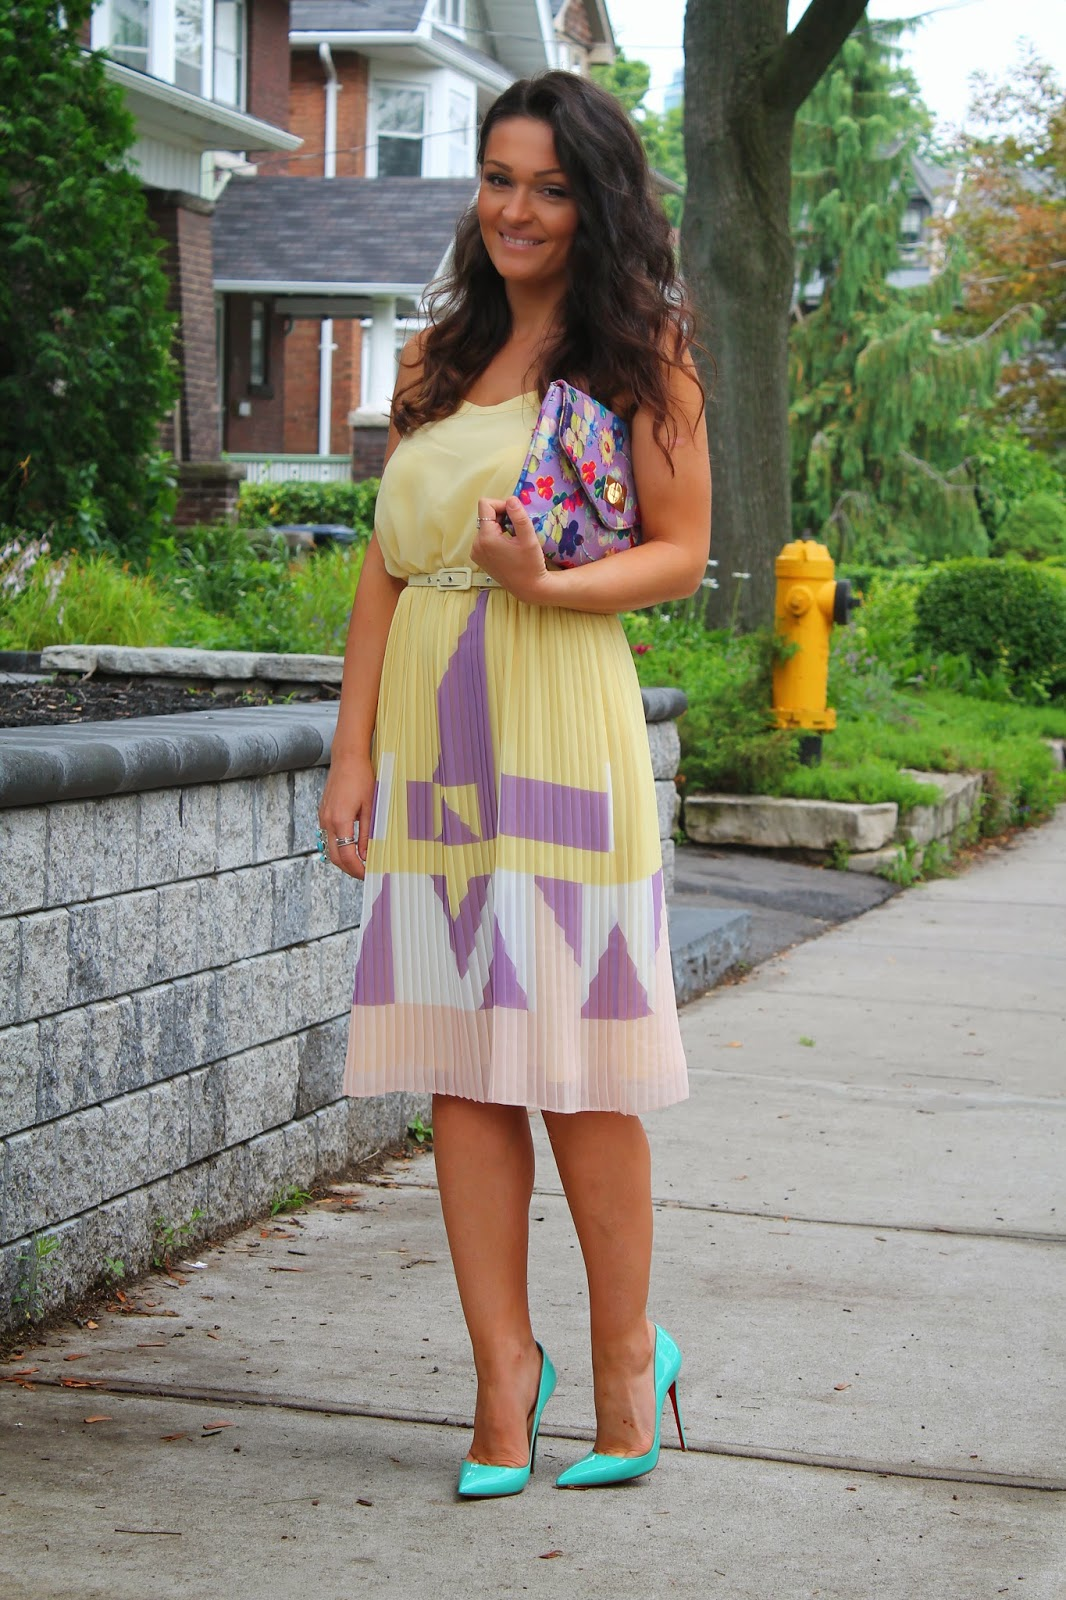 Feminine summer dress, feminine pastel dress, feminine yellow dress, pleated dress, summer outfit, blogerke, canadian fashion blogger, toronto street style